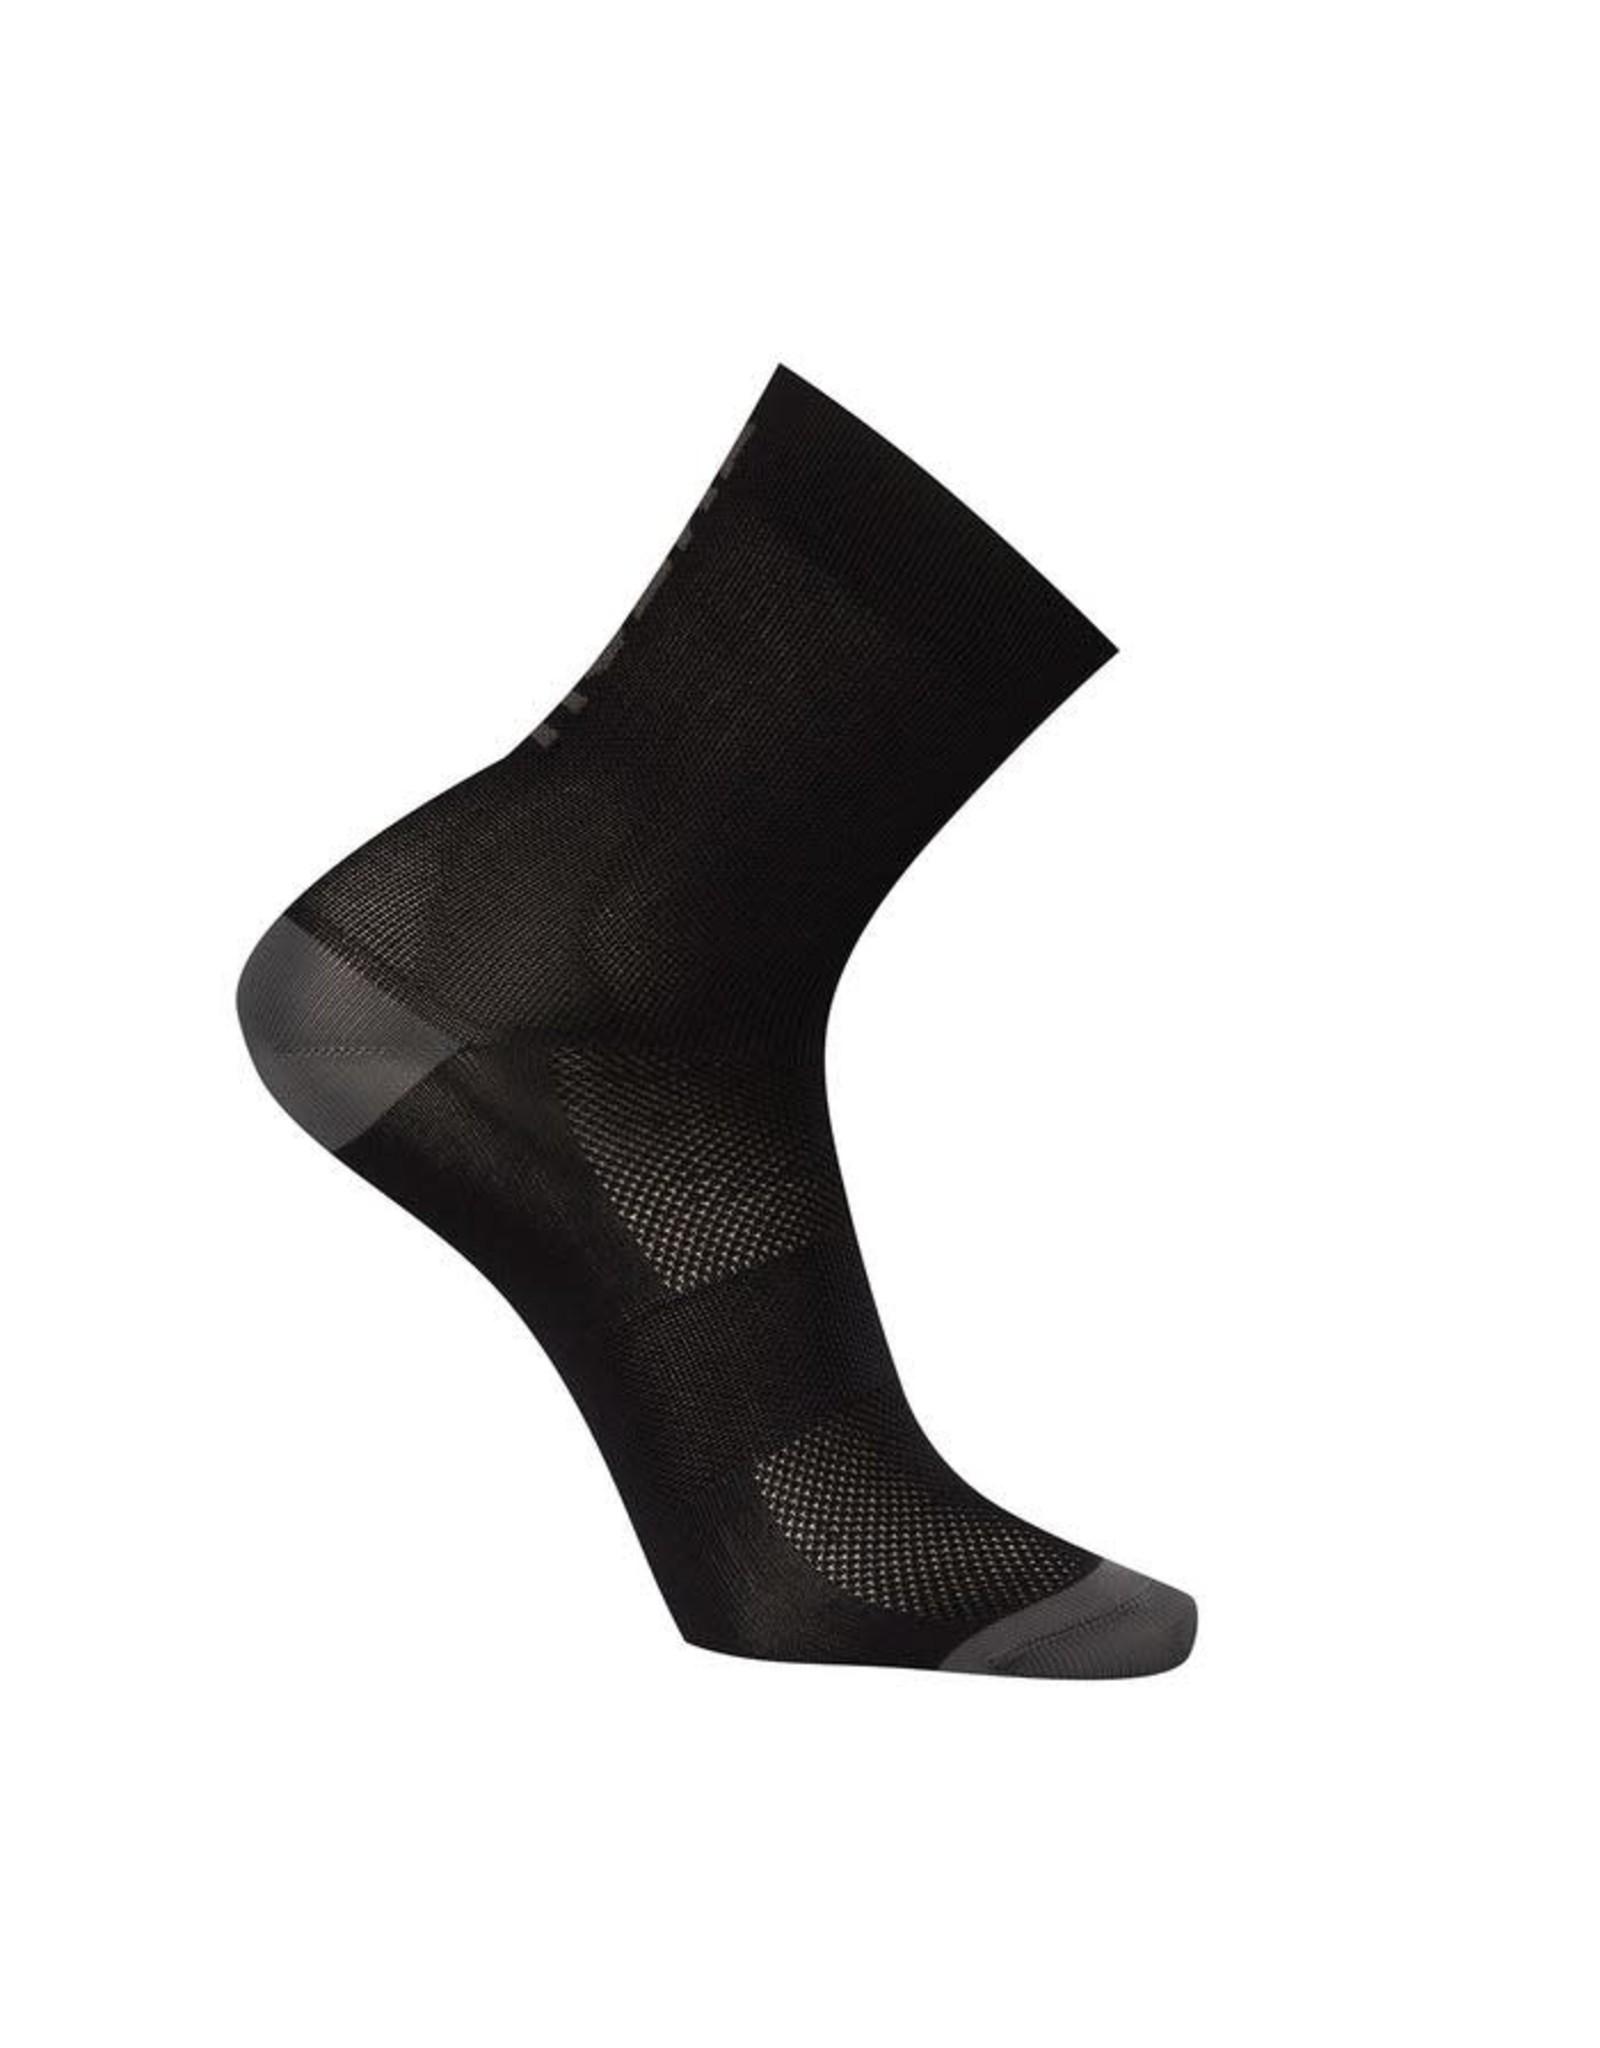 7MESH 7MESH - Word Sock Black XL